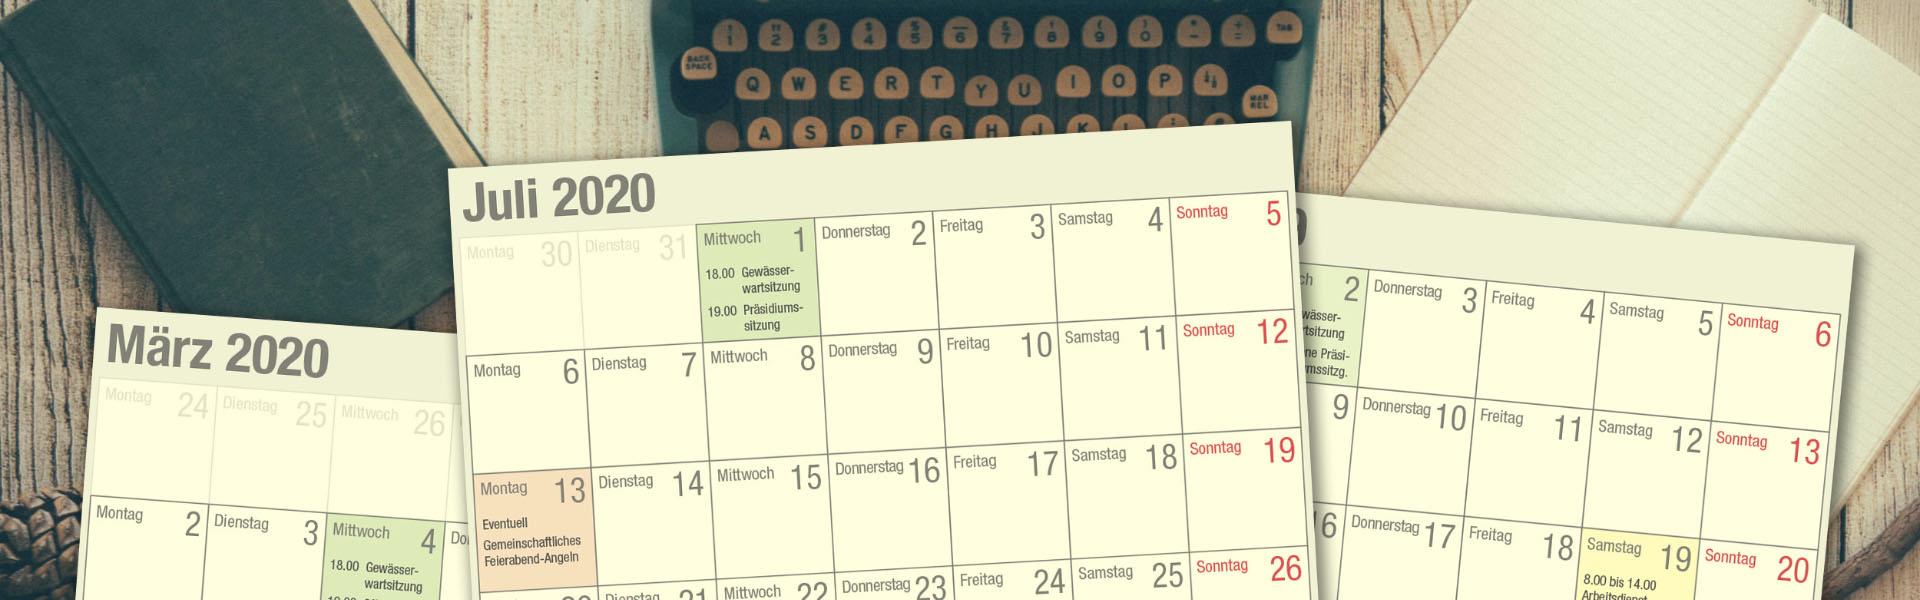 Kalender_Head_2020